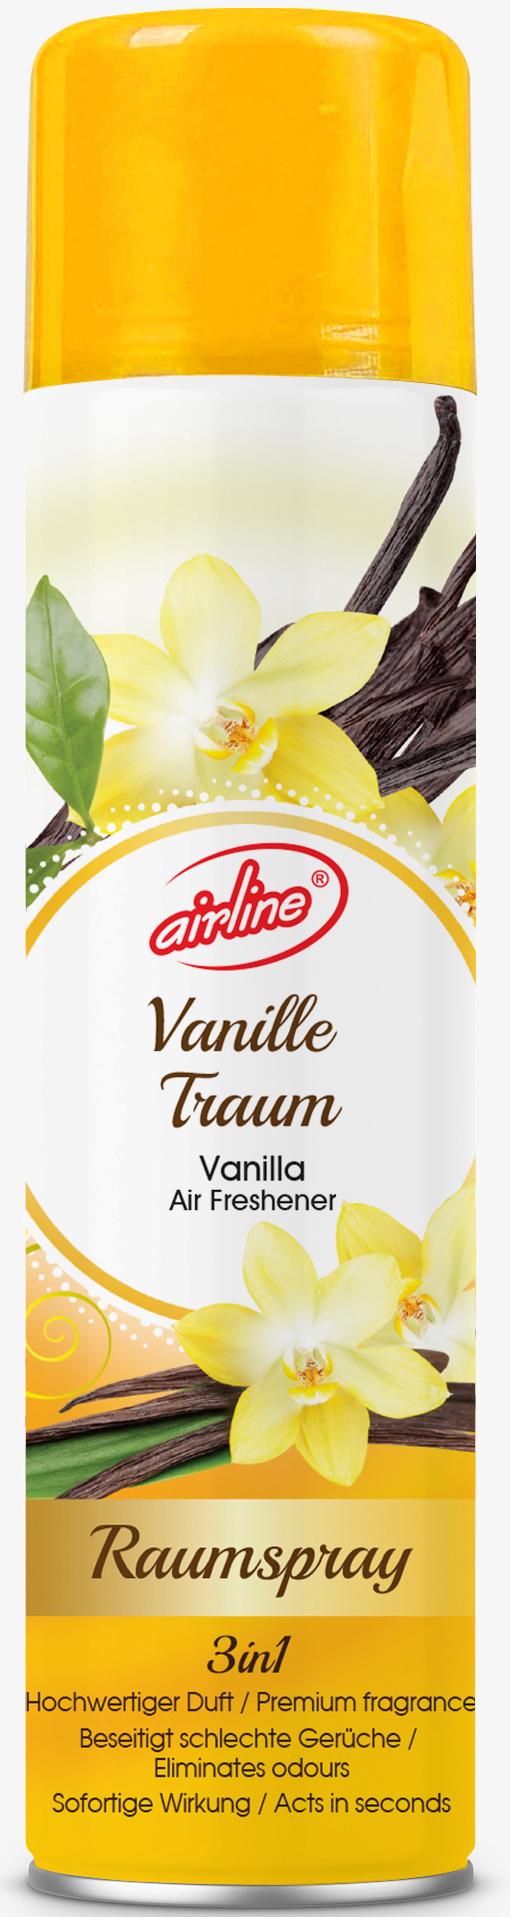 00514 - air freshener spray 300 ml - vanilla